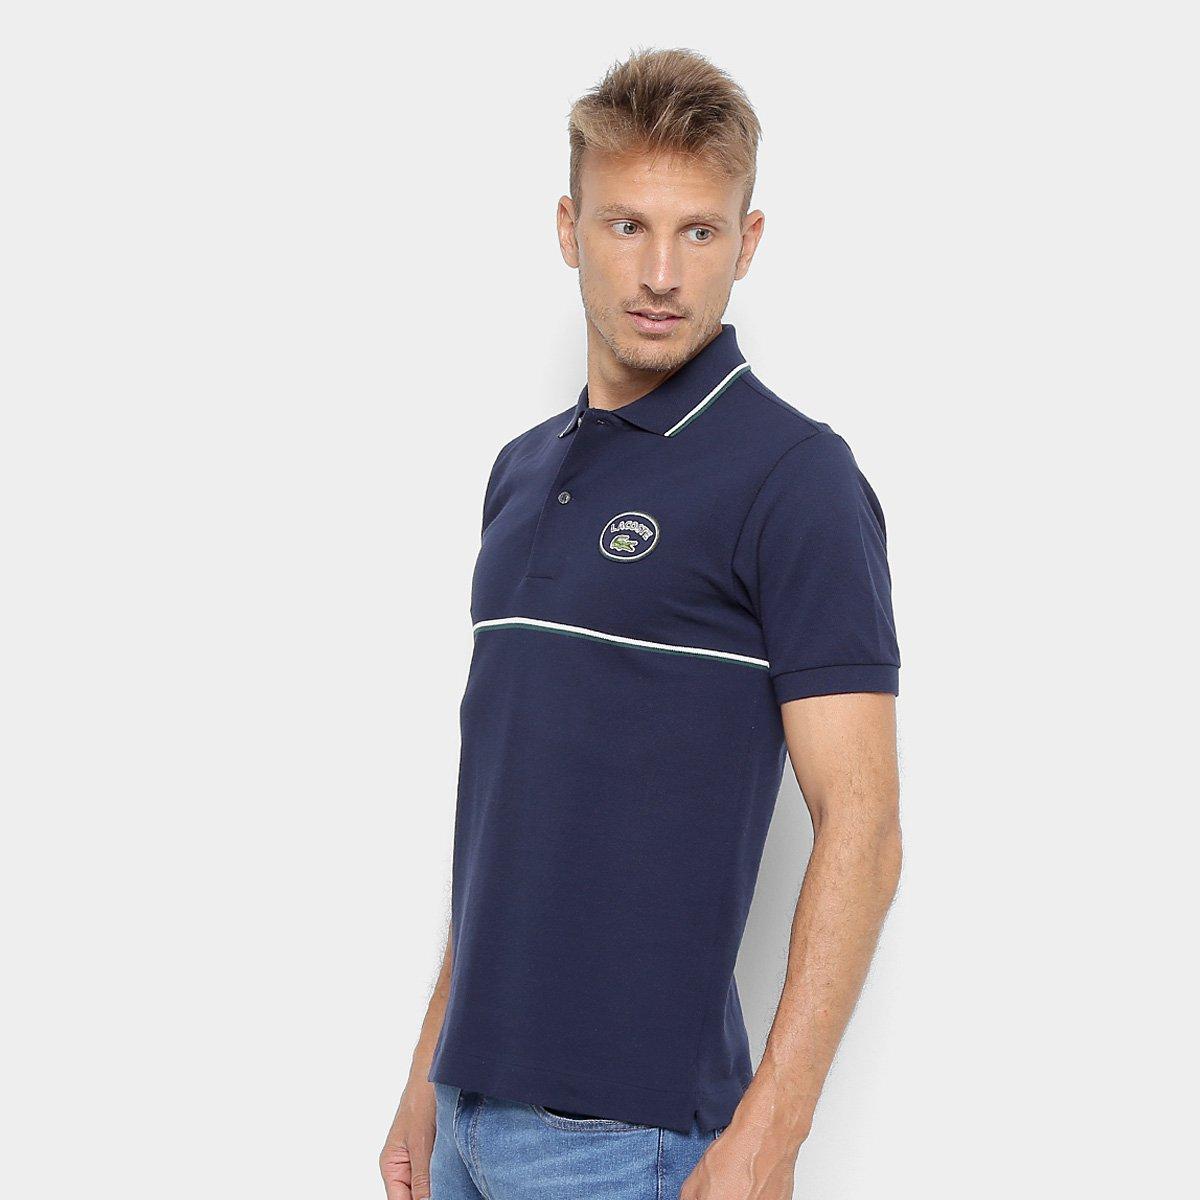 0cc34646ab Camisas Polo Lacoste Masculino PH2284-21